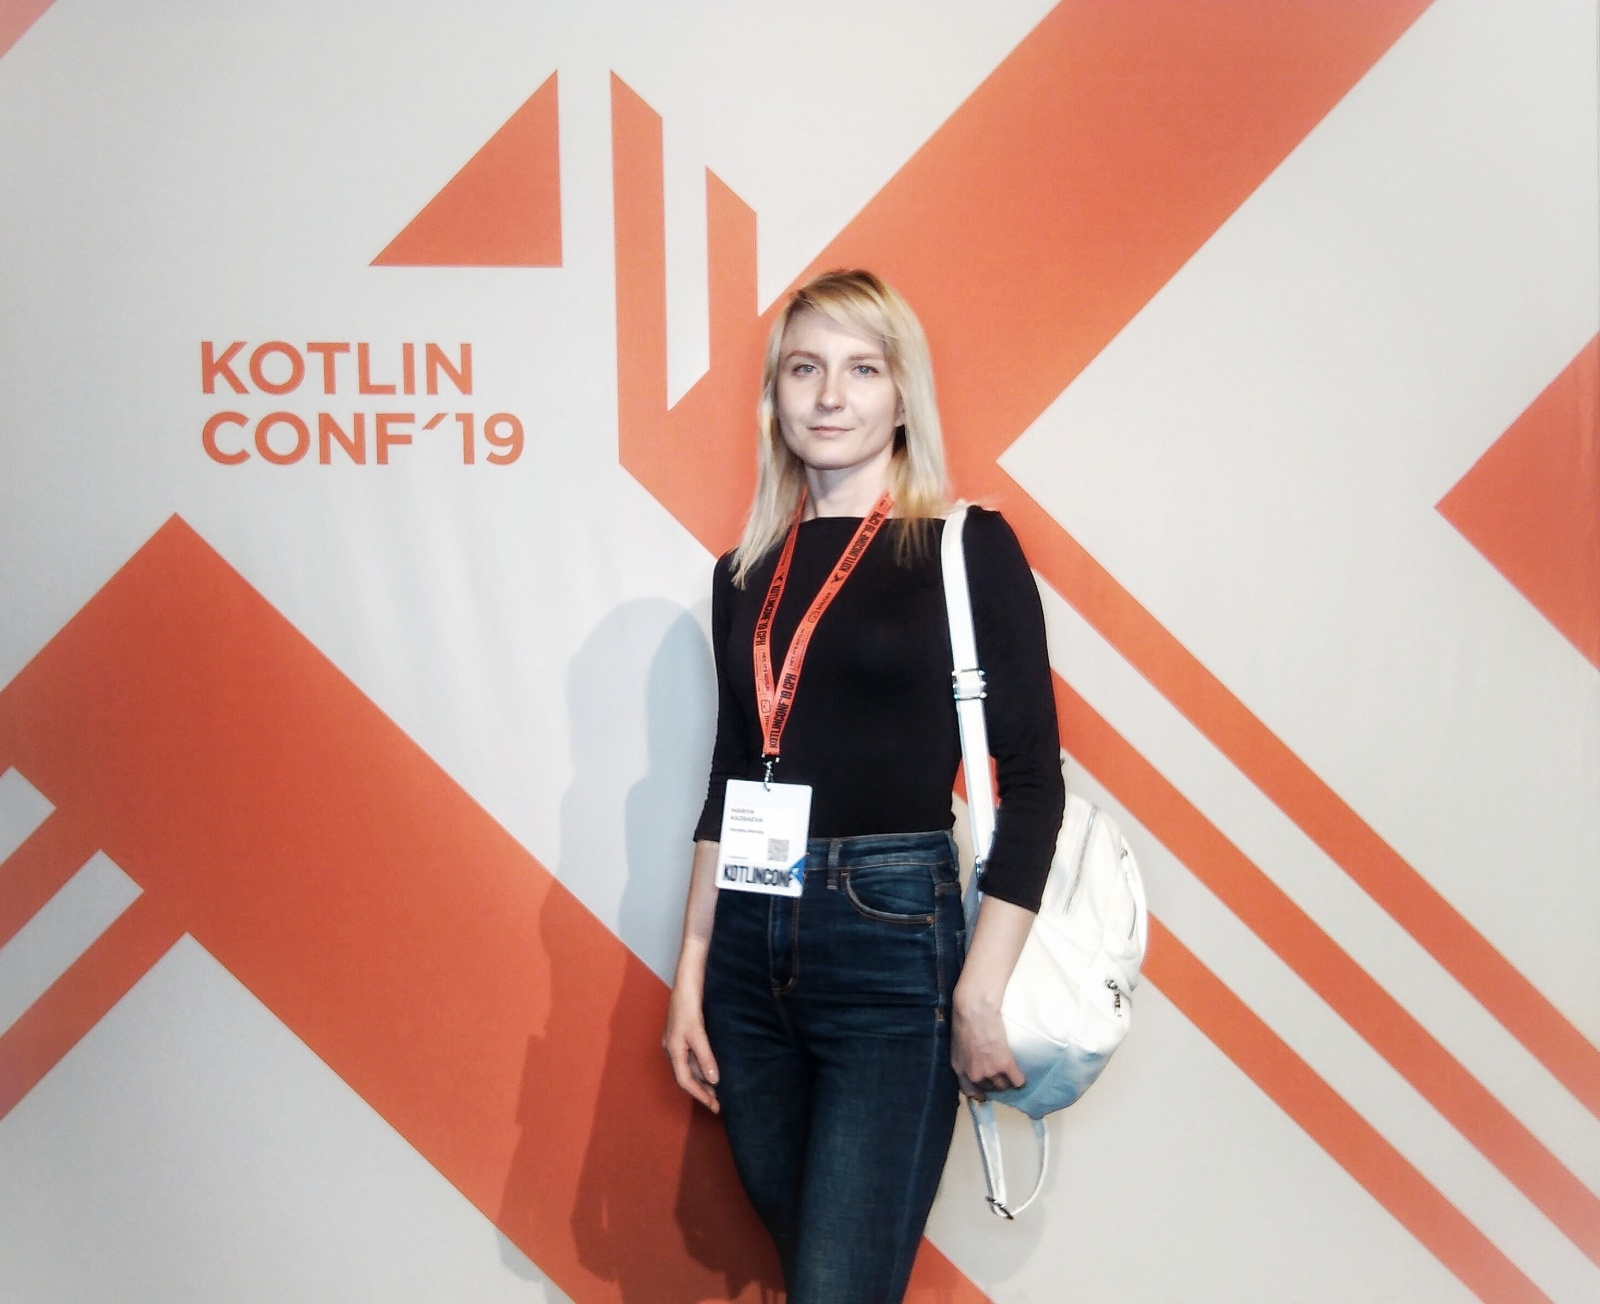 Хюгге для разработчиков, или как я съездила на KotlinConf - 10